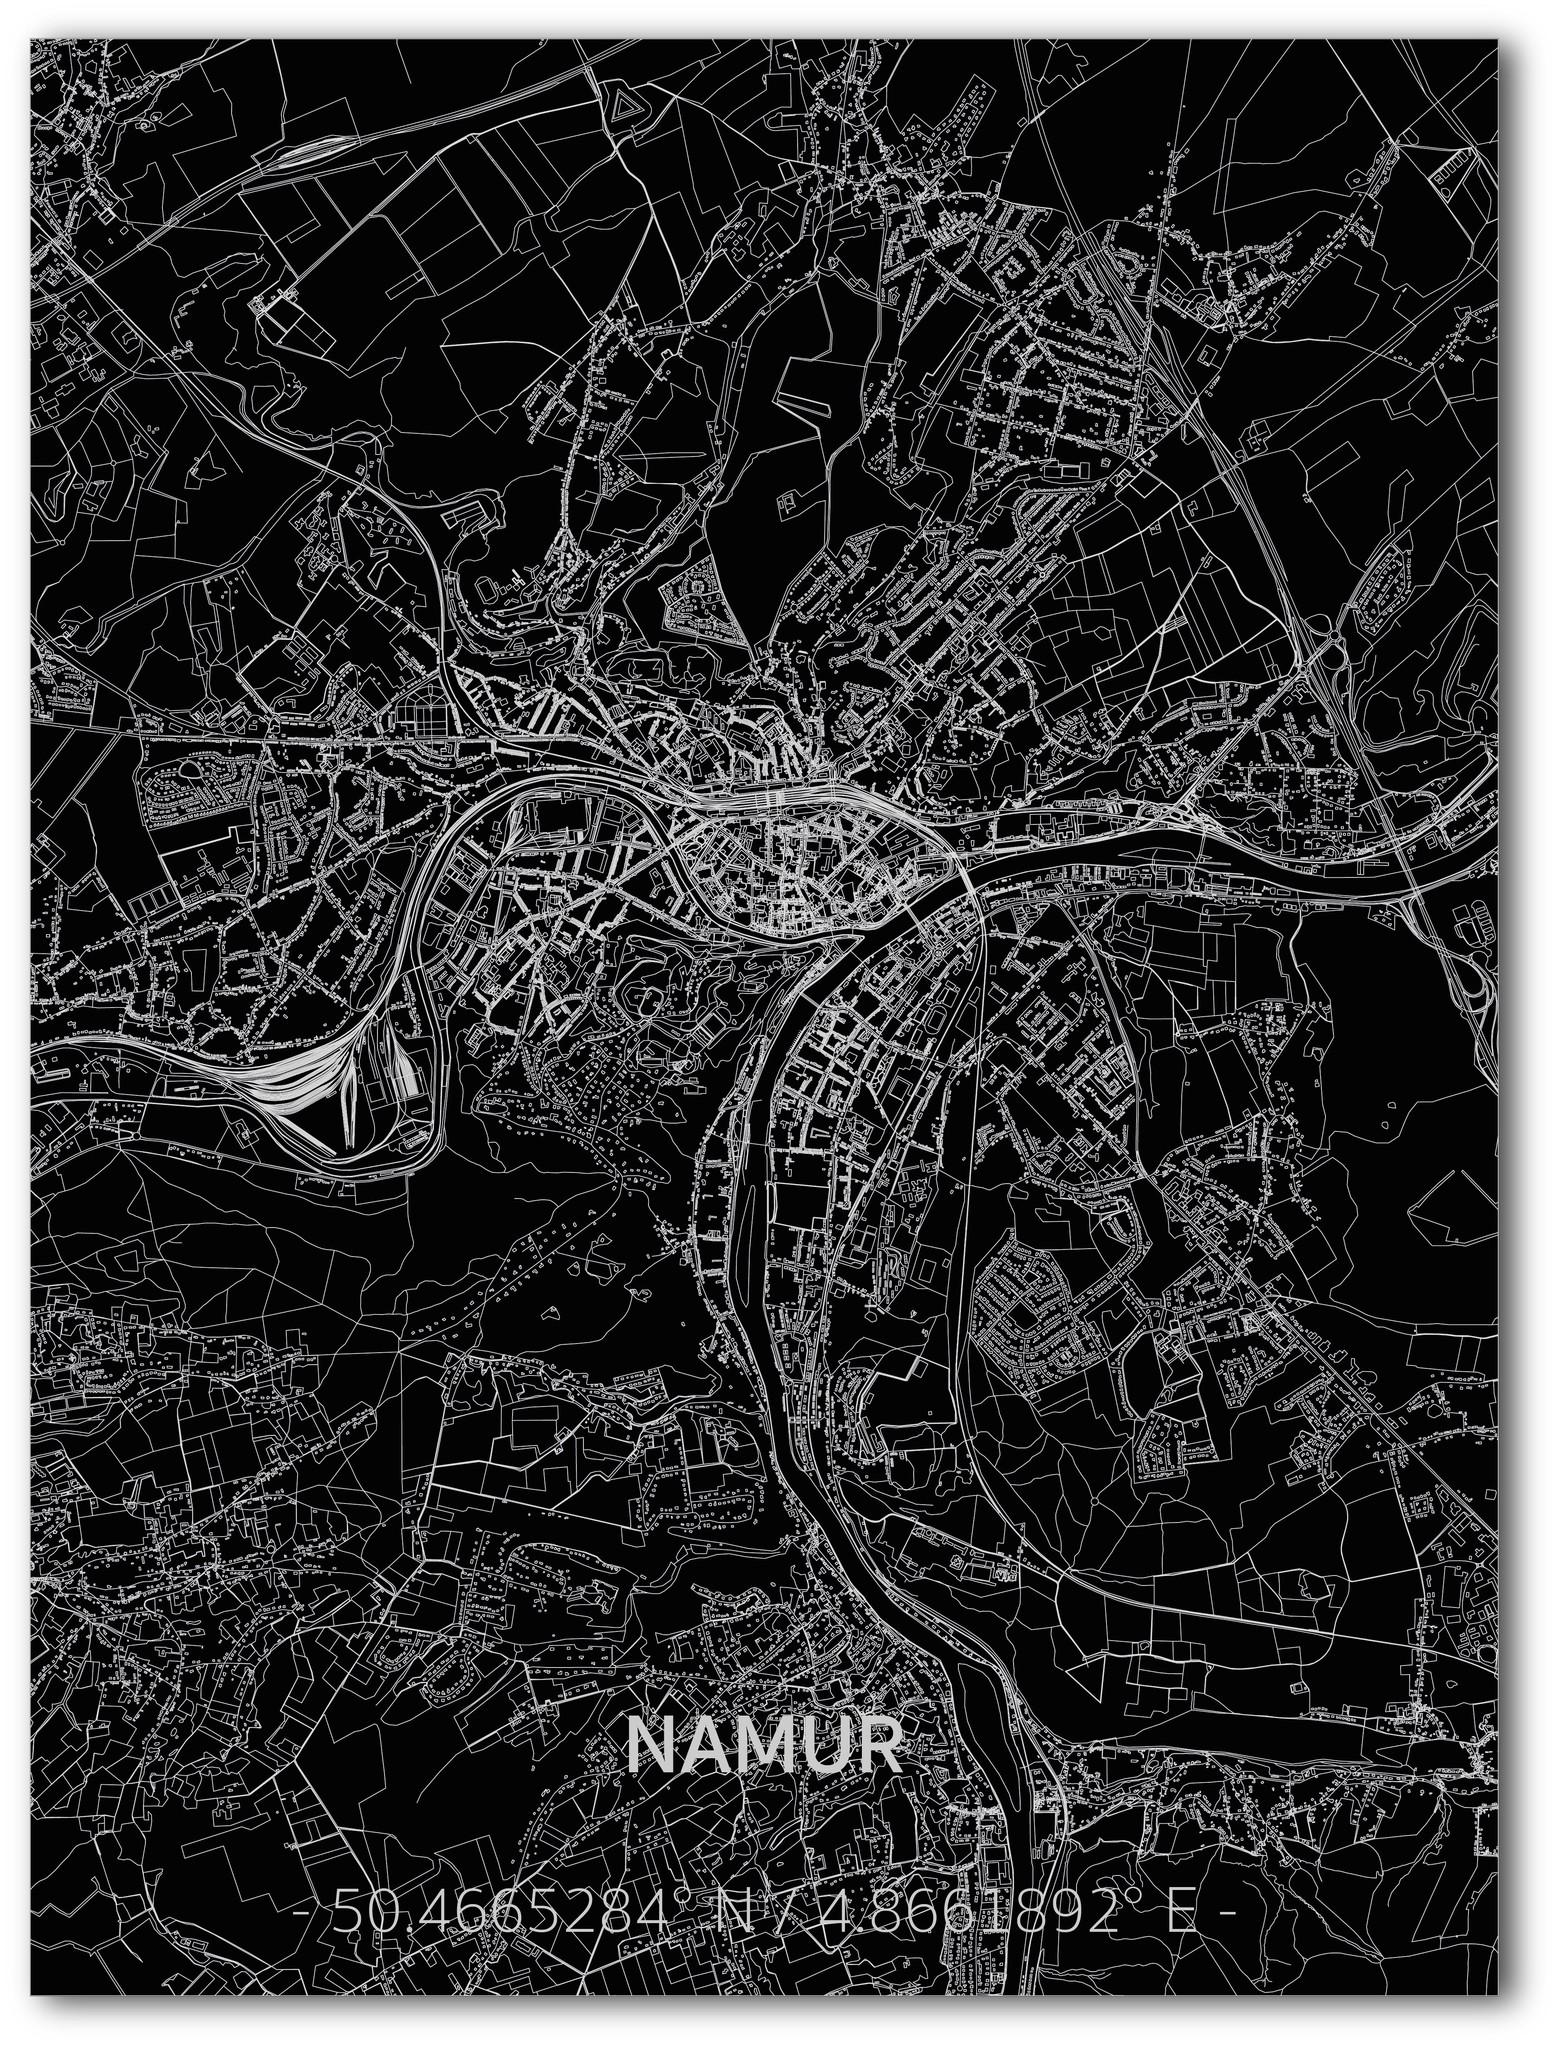 Stadtkarte Namur | Aluminium Wanddekoration-1